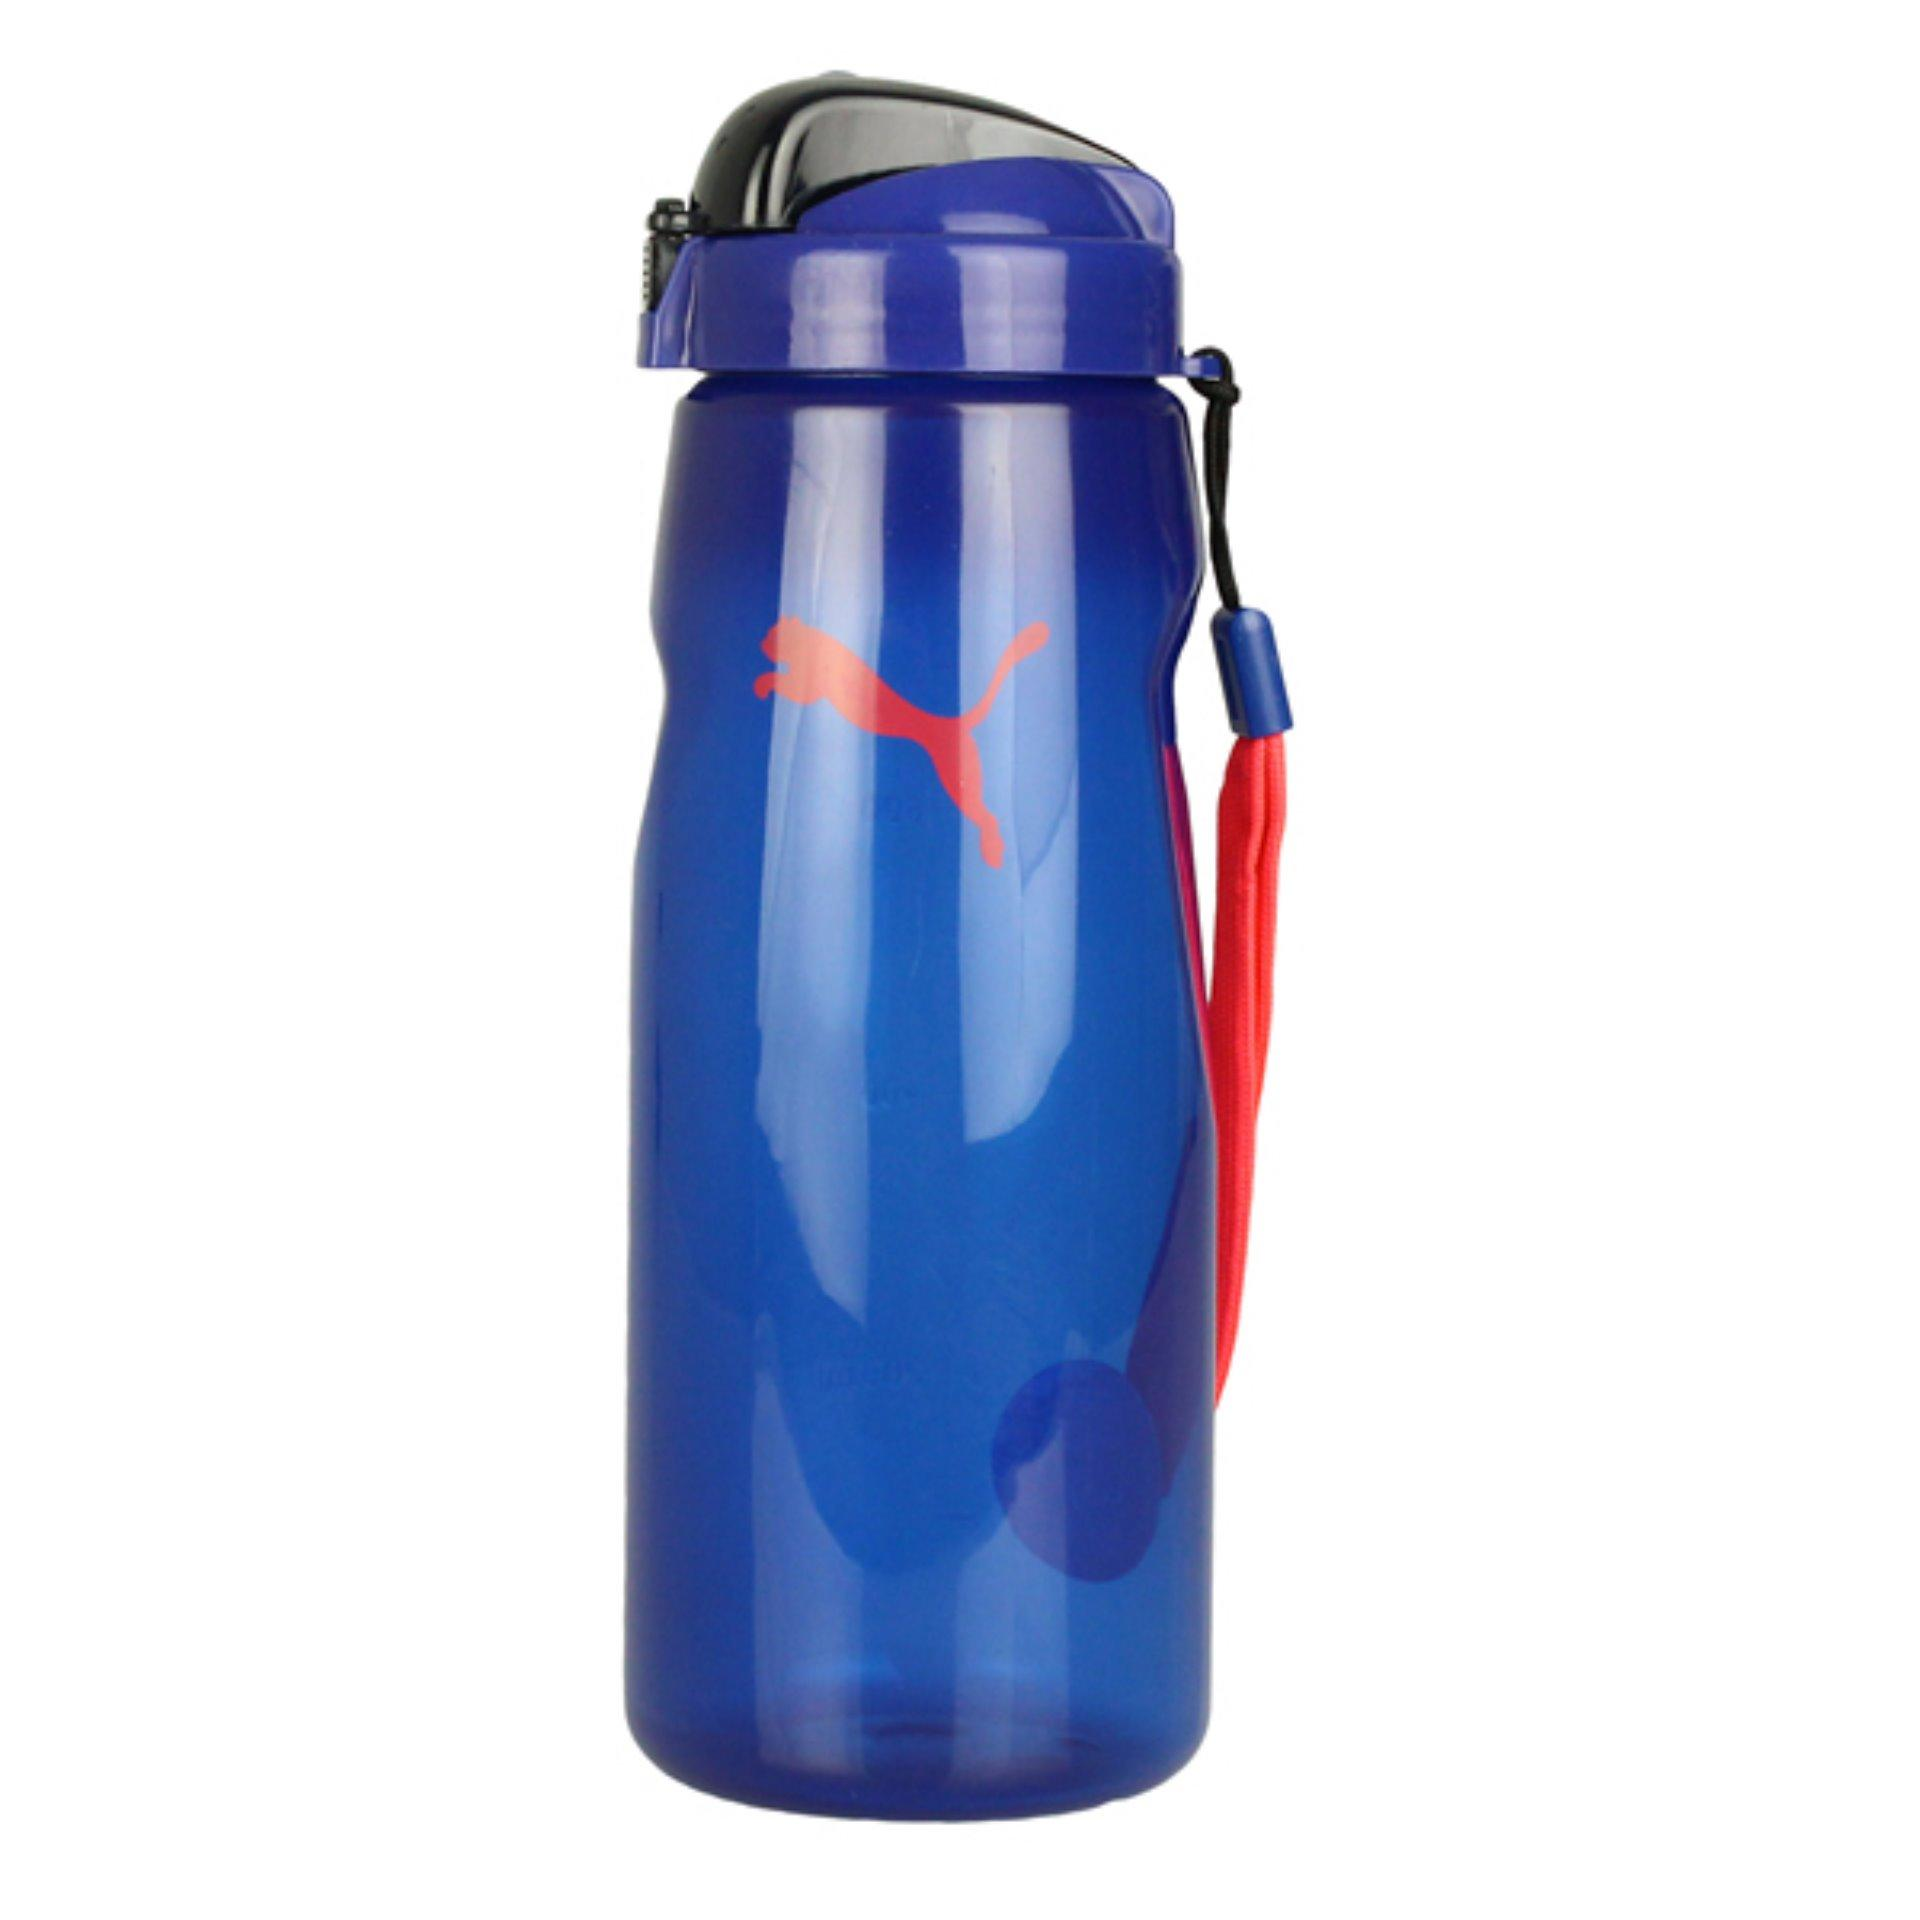 Botol Minum Lifestyle 750ml - 05284110 - Biru